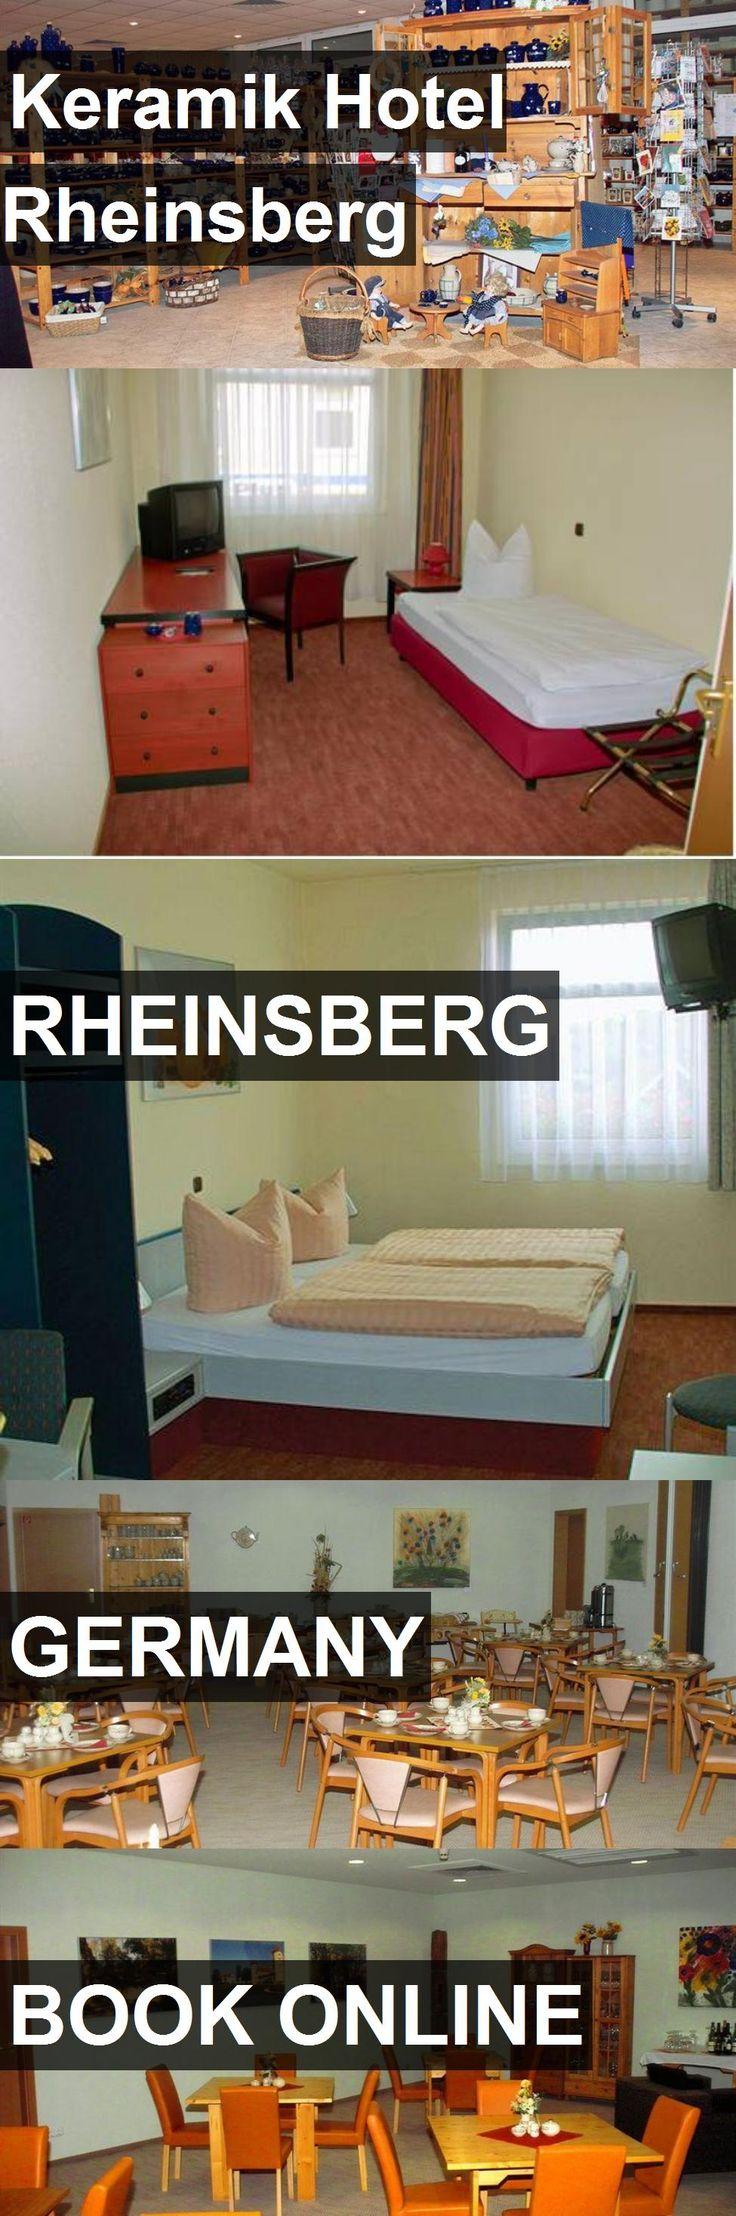 Keramik Hotel Rheinsberg in Rheinsberg, Germany. For more information, photos, reviews and best prices please follow the link. #Germany #Rheinsberg #travel #vacation #hotel